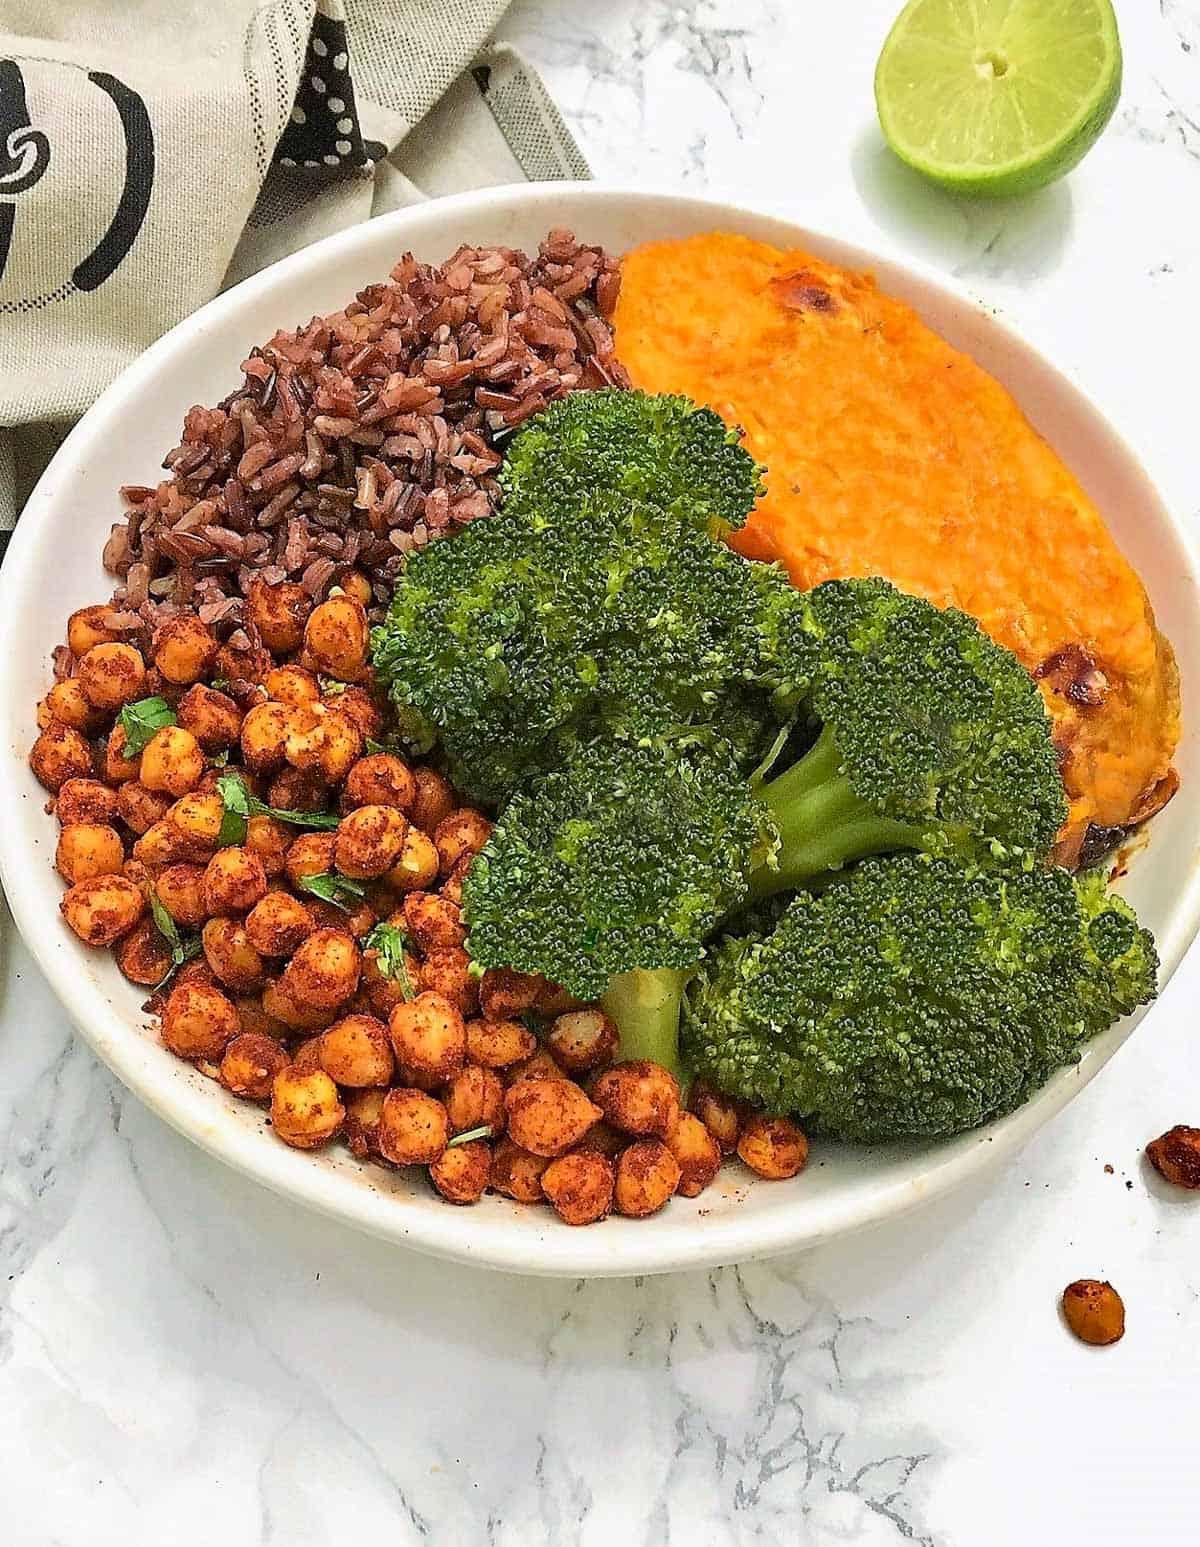 Bowl of rice, broccoli, sweet potato and chickpeas.